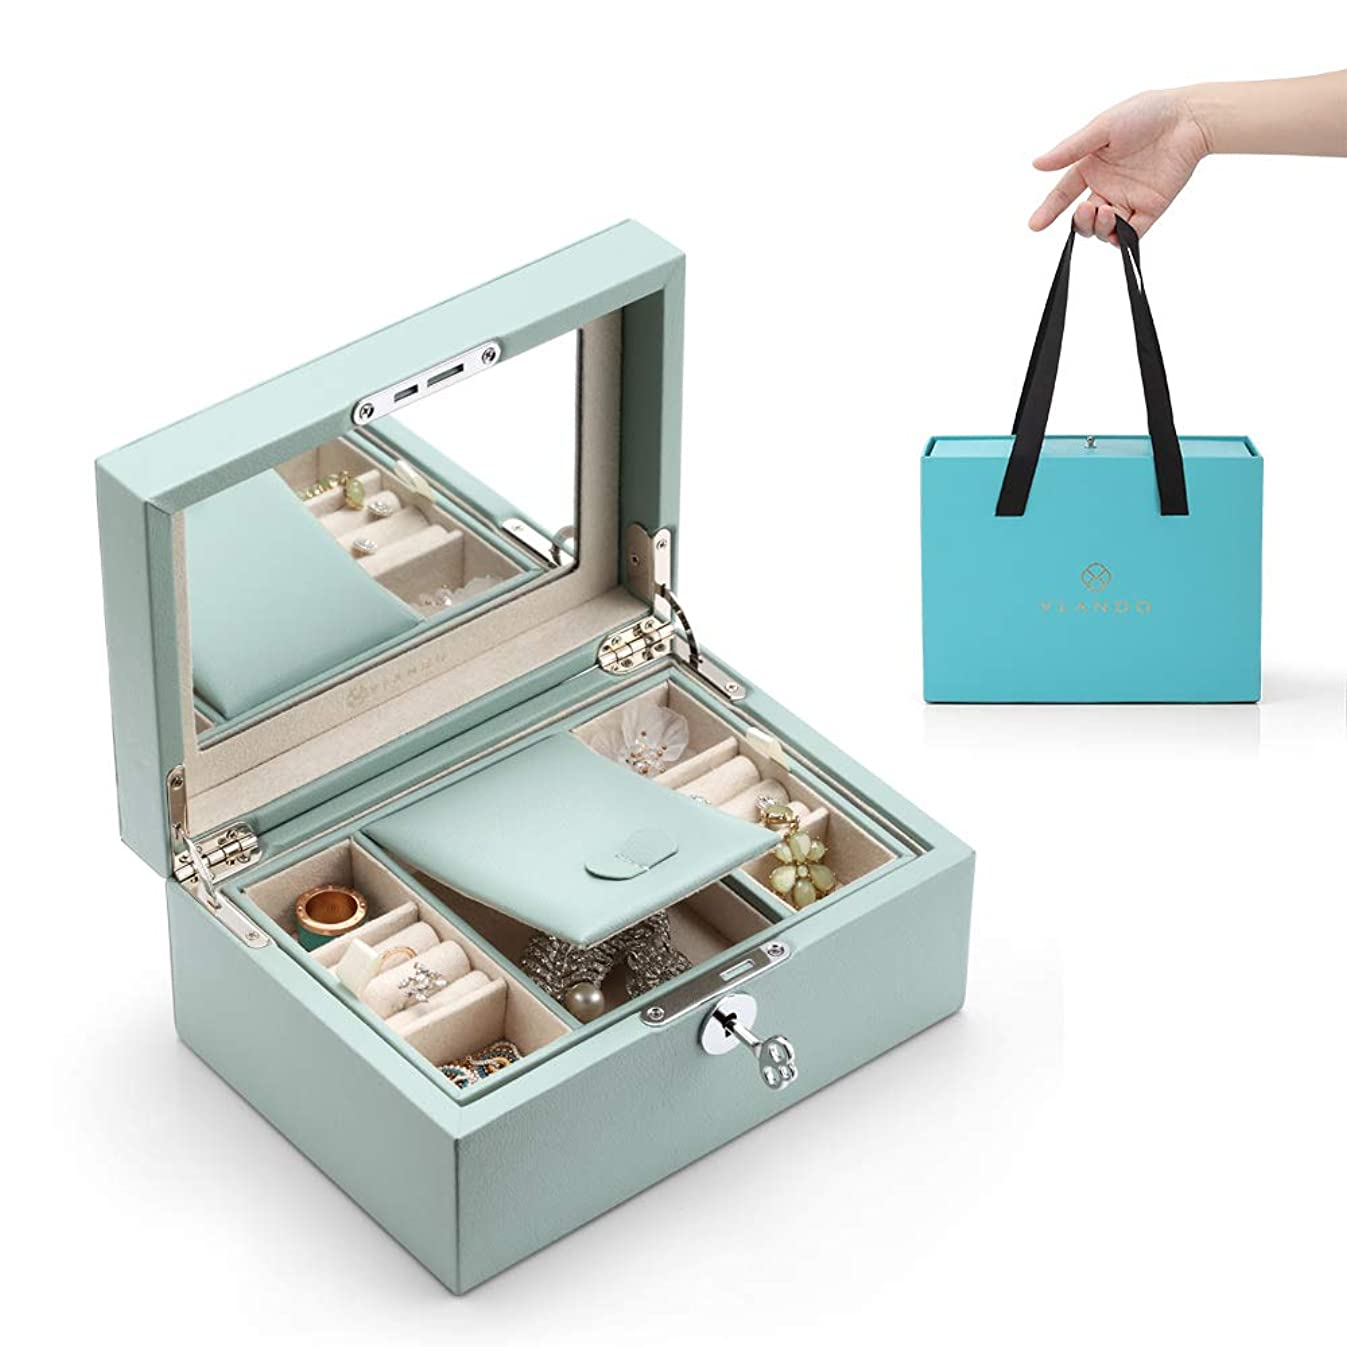 Vlando Lockable Jewlery Box, Two Tray Jewelries Collections Organizer, Girls Gift -Aqua Green